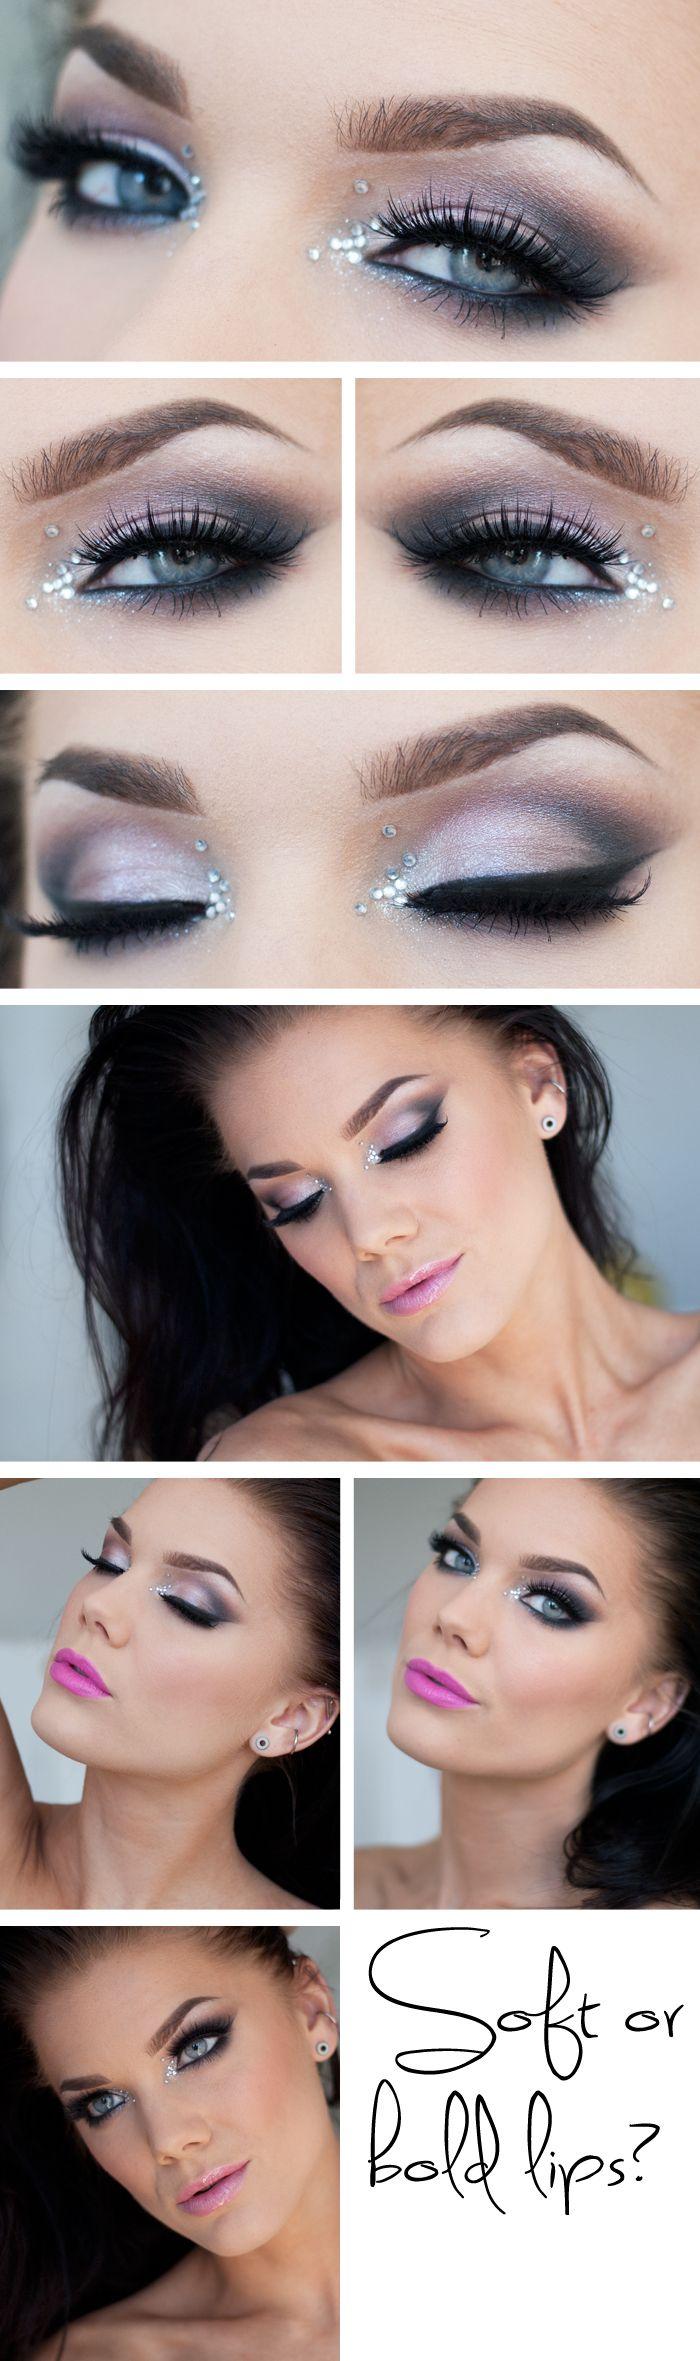 soft pink shadows create the perfect light smokey eye